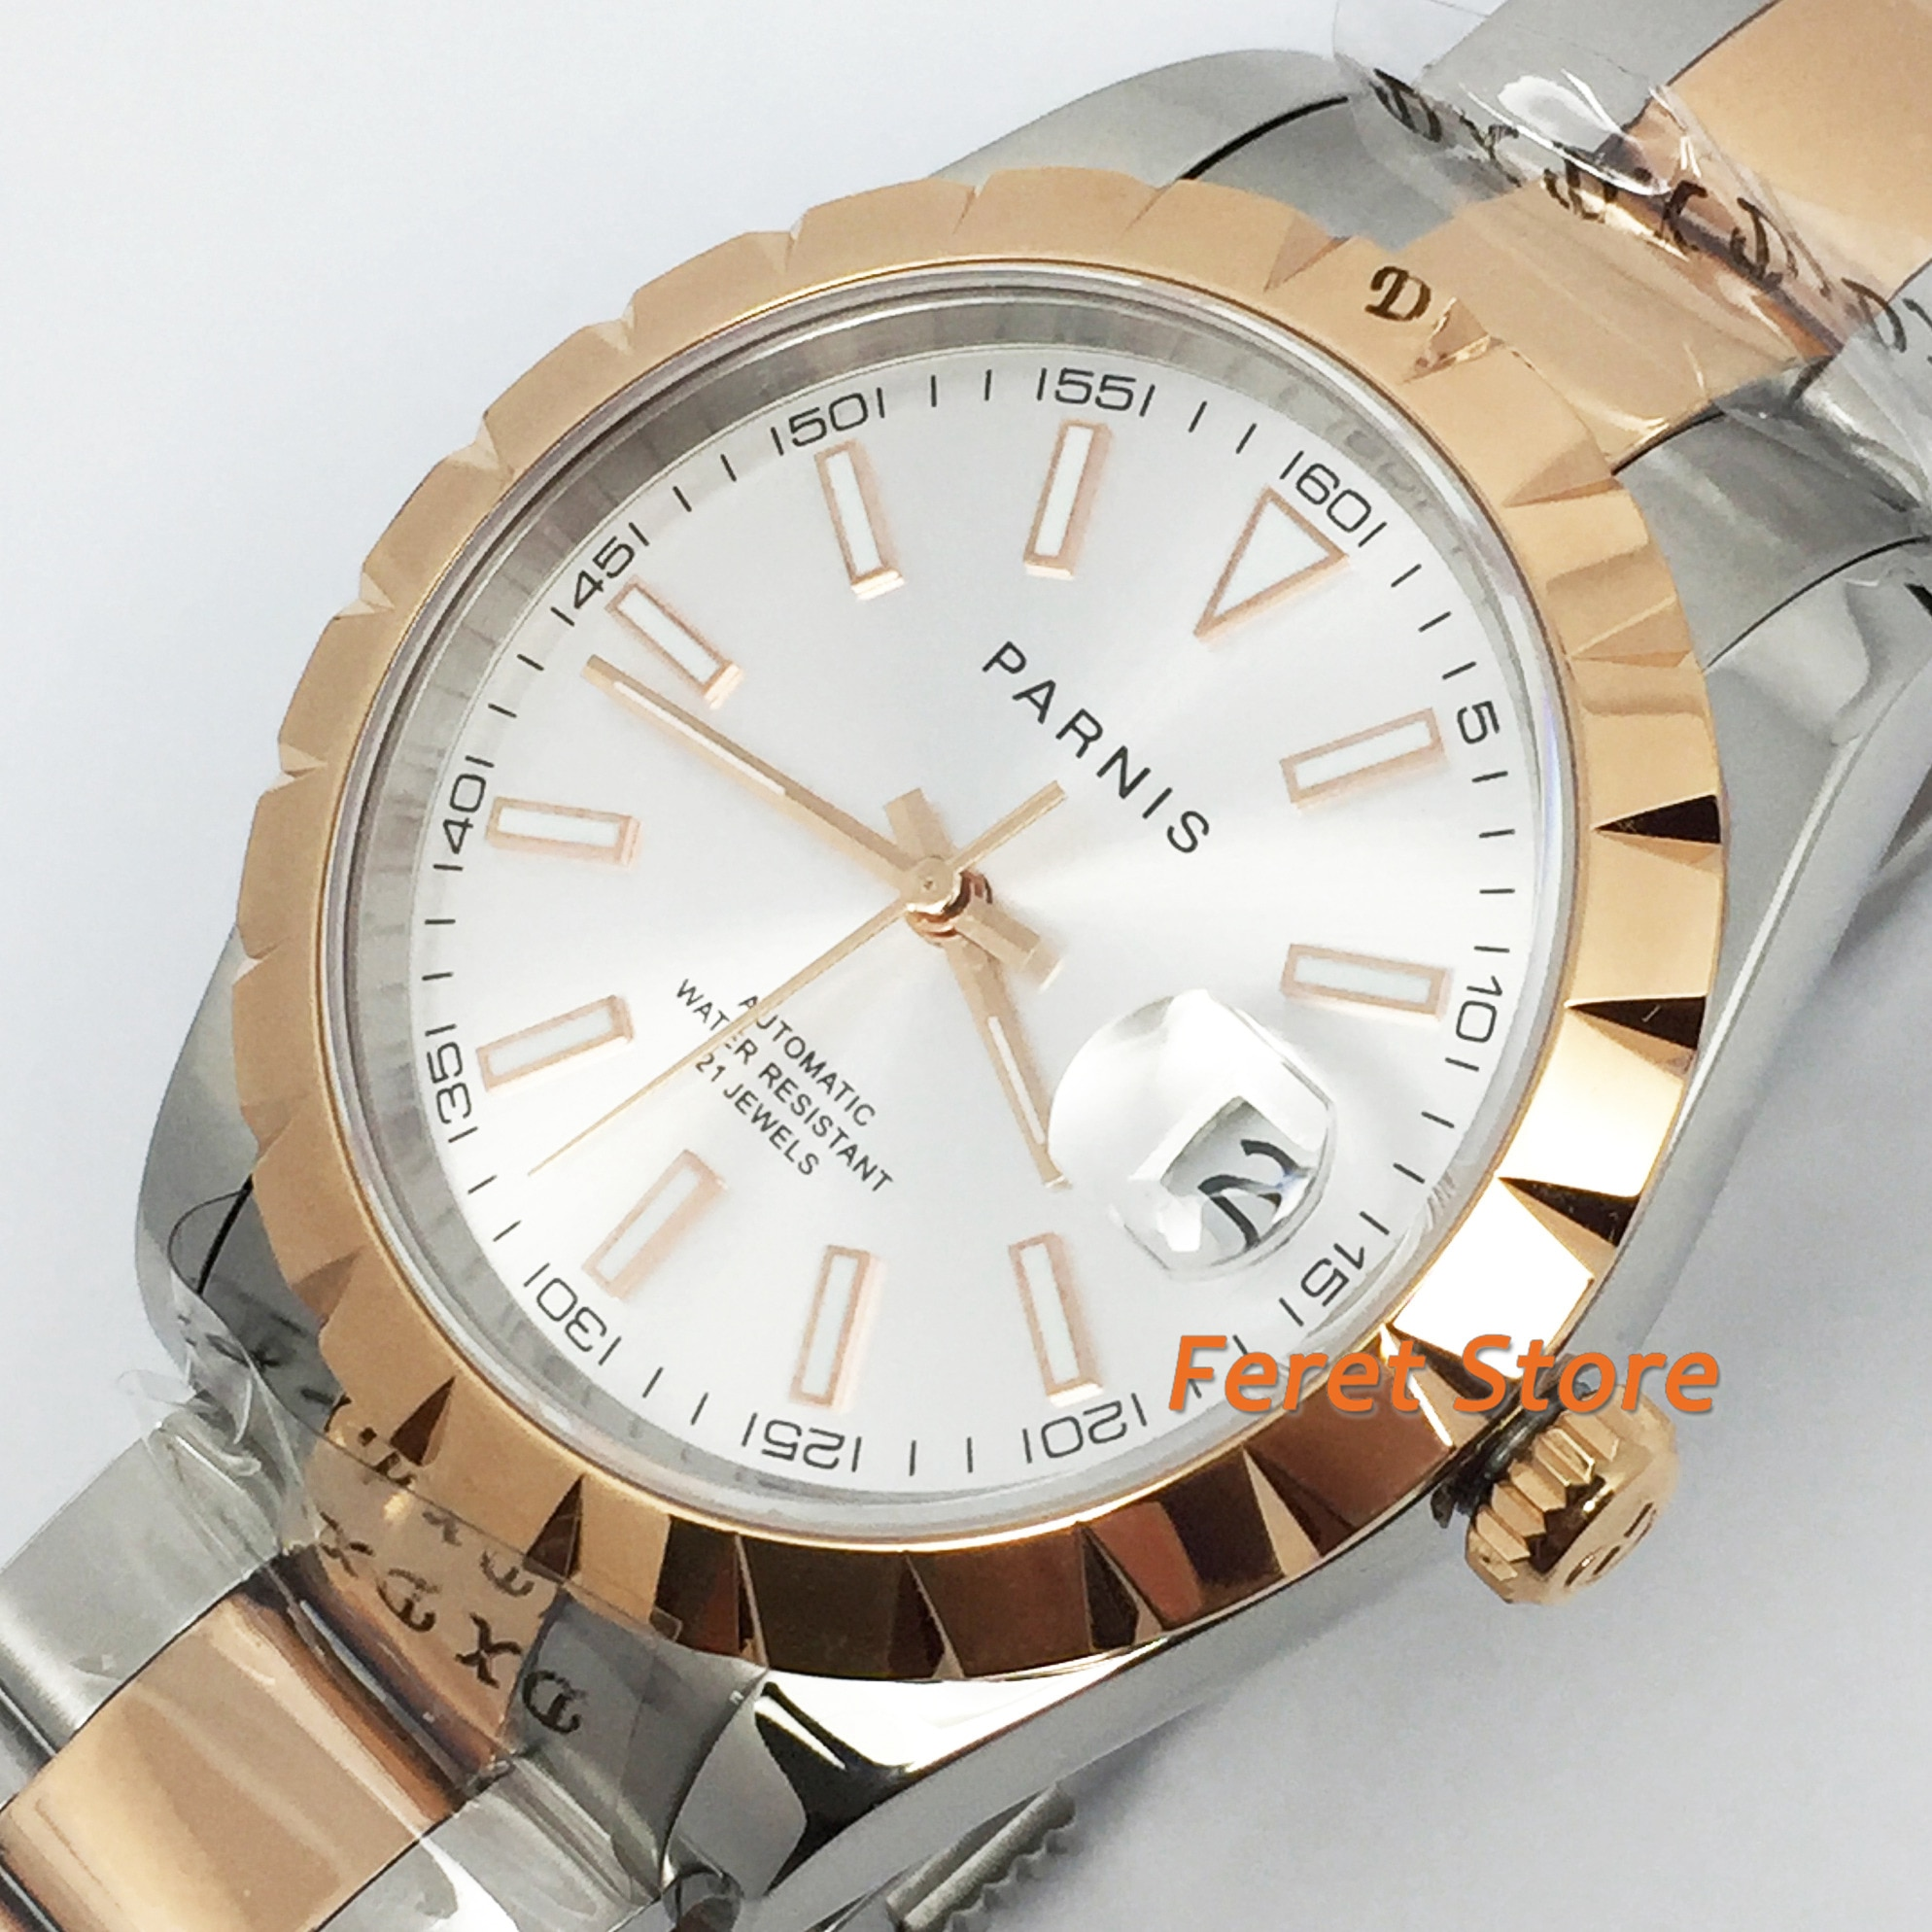 Parnis, novedad de 2020, reloj de negocios para hombres, carcasa de oro rosa, cristal de zafiro con abertura para fecha, 21 joyas, mecanismo Miyota, reloj automático